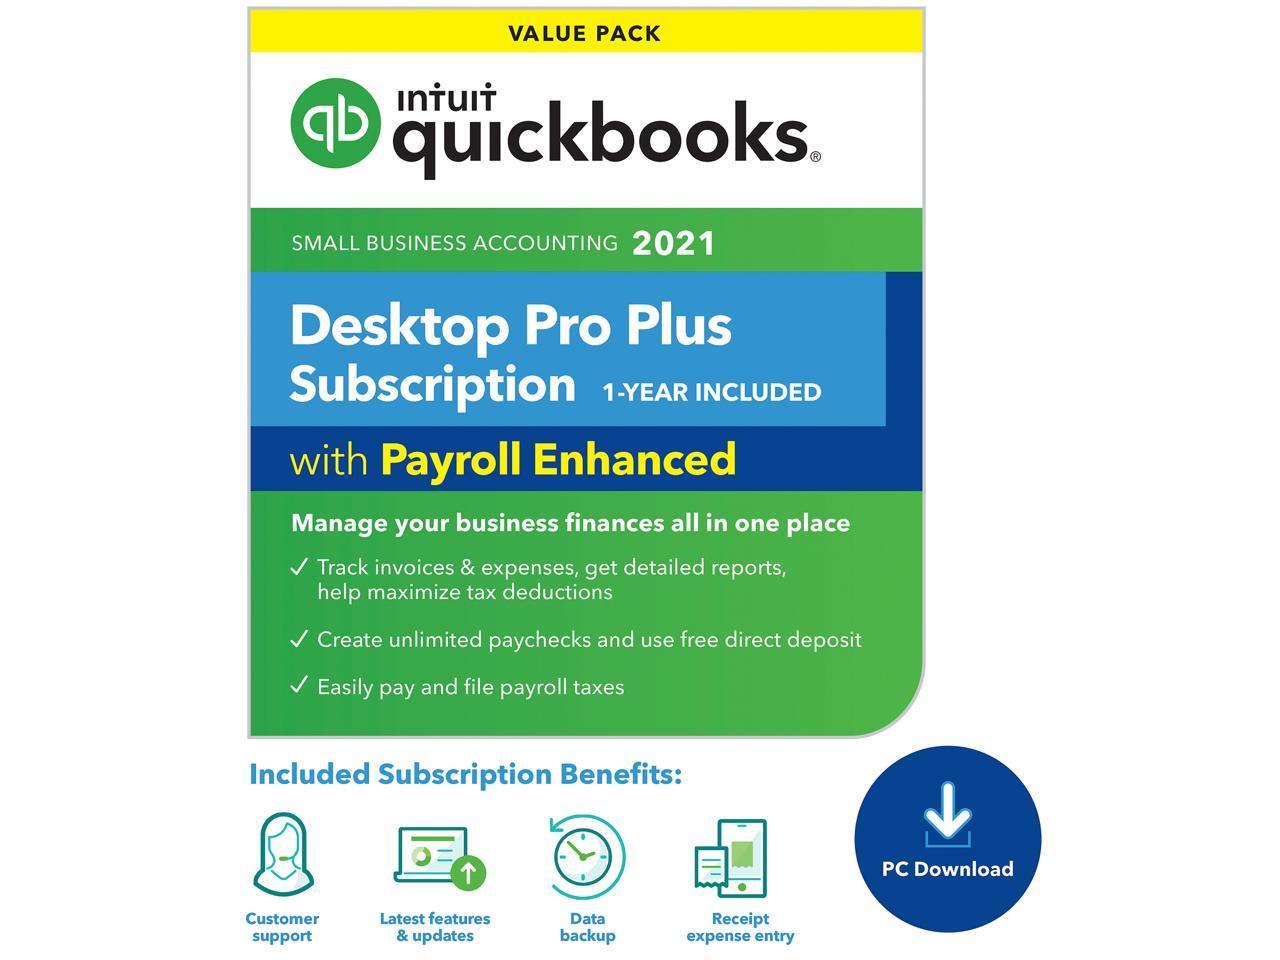 Quickbooks Pro Plus w/ Payroll Enhanced + $200 Lowe's Giftcard $399